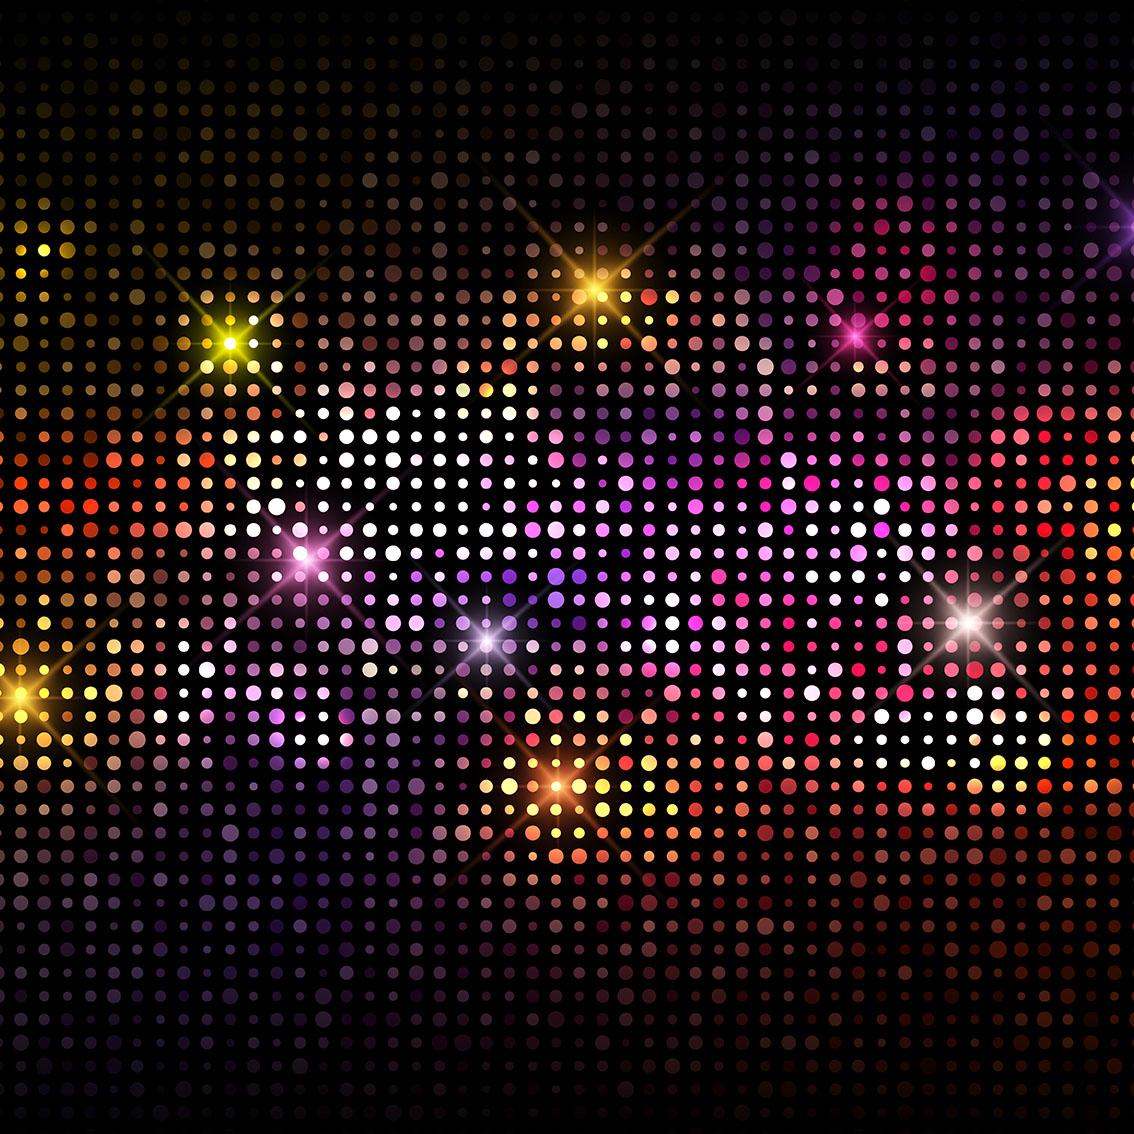 Disco lights background download free vector art stock - Club lights wallpaper ...